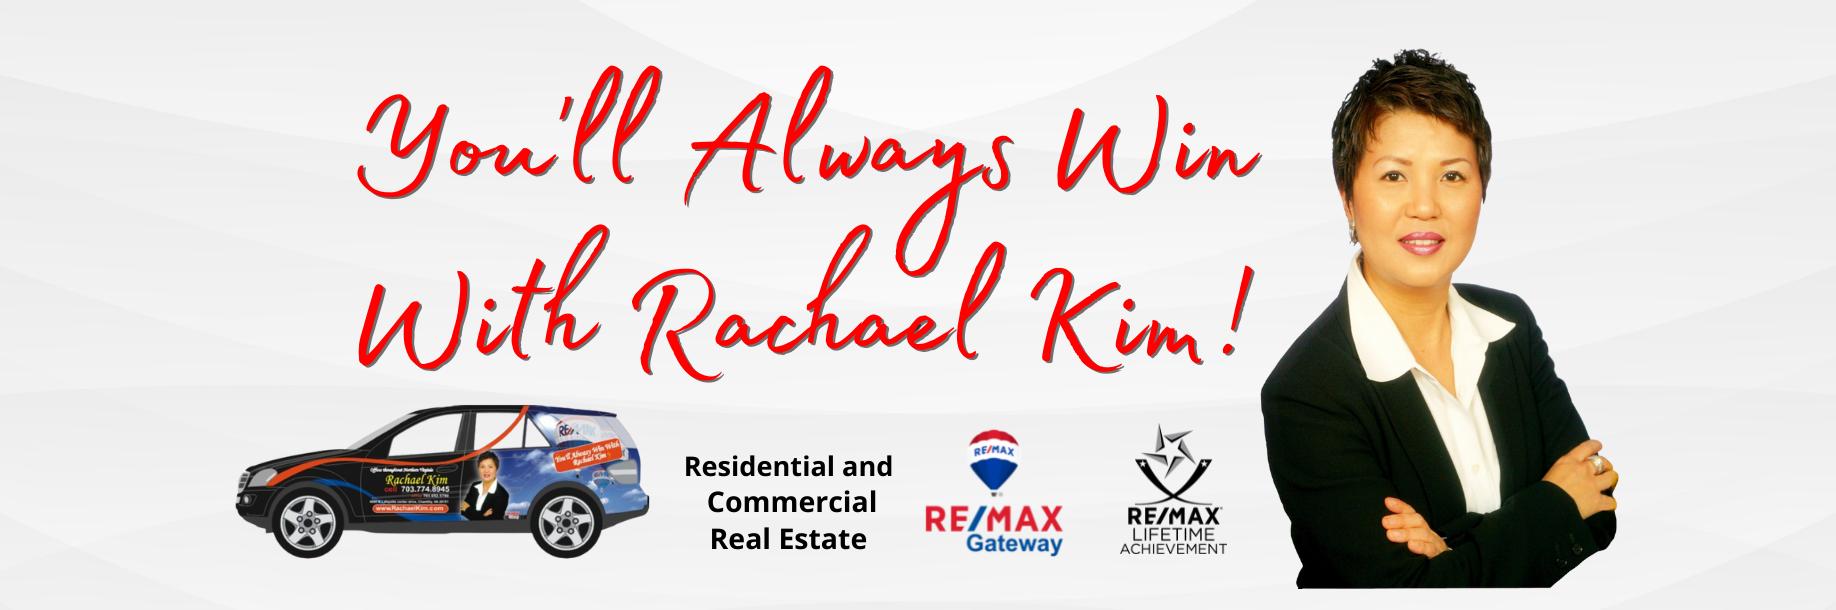 Rachael Kim, REALTOR, Northern Virginia